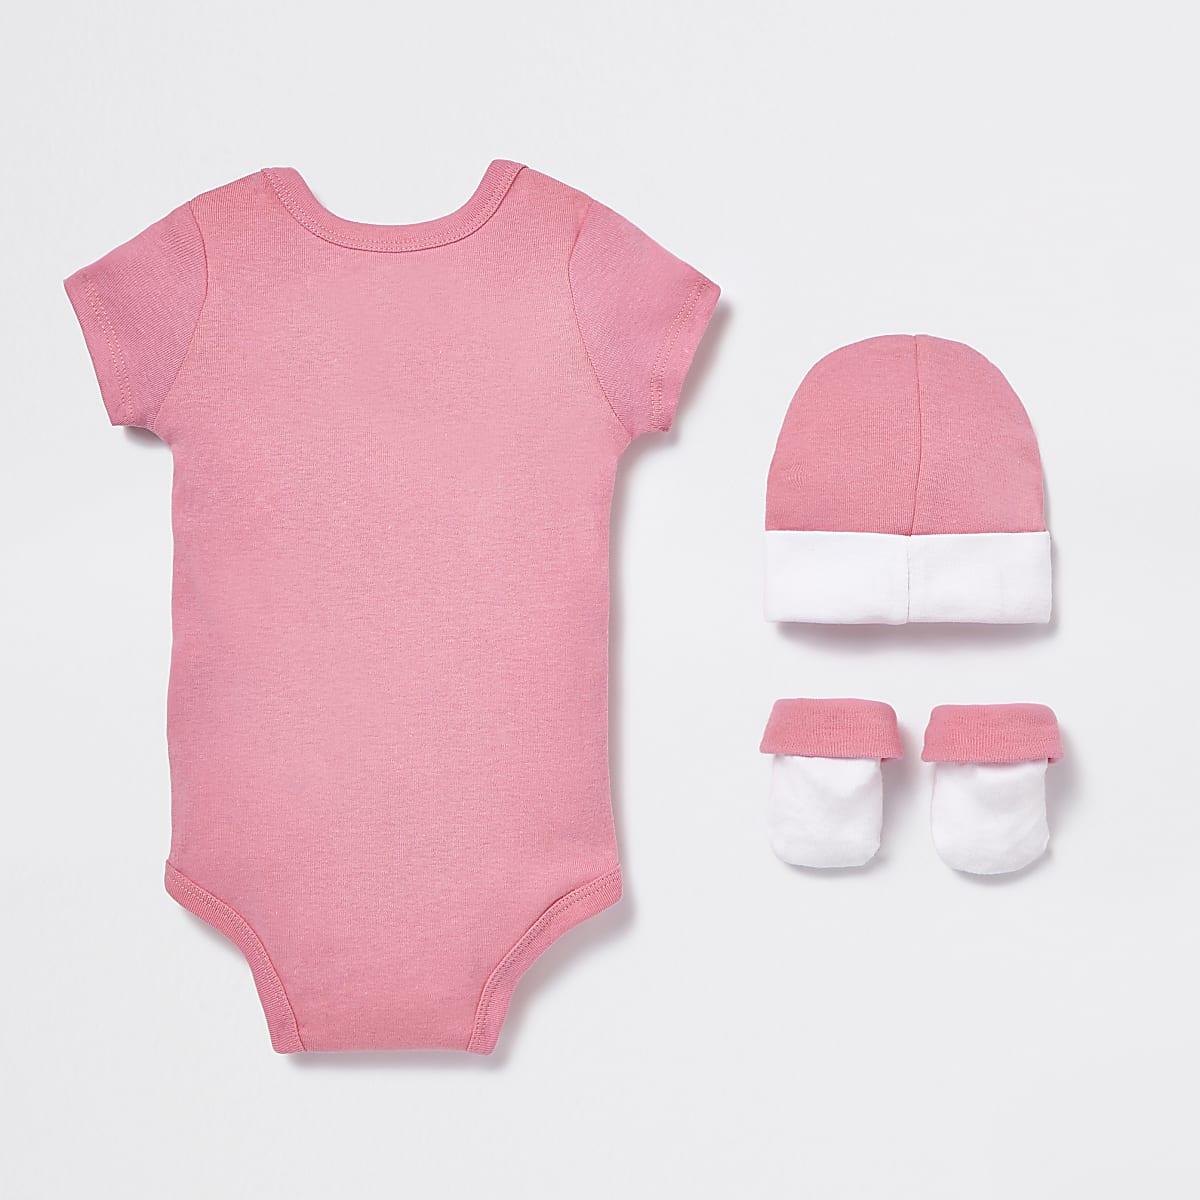 b6c7cc0032c1 Baby Converse All Star pink set - Baby Girls Babygrows - Mini Girls ...